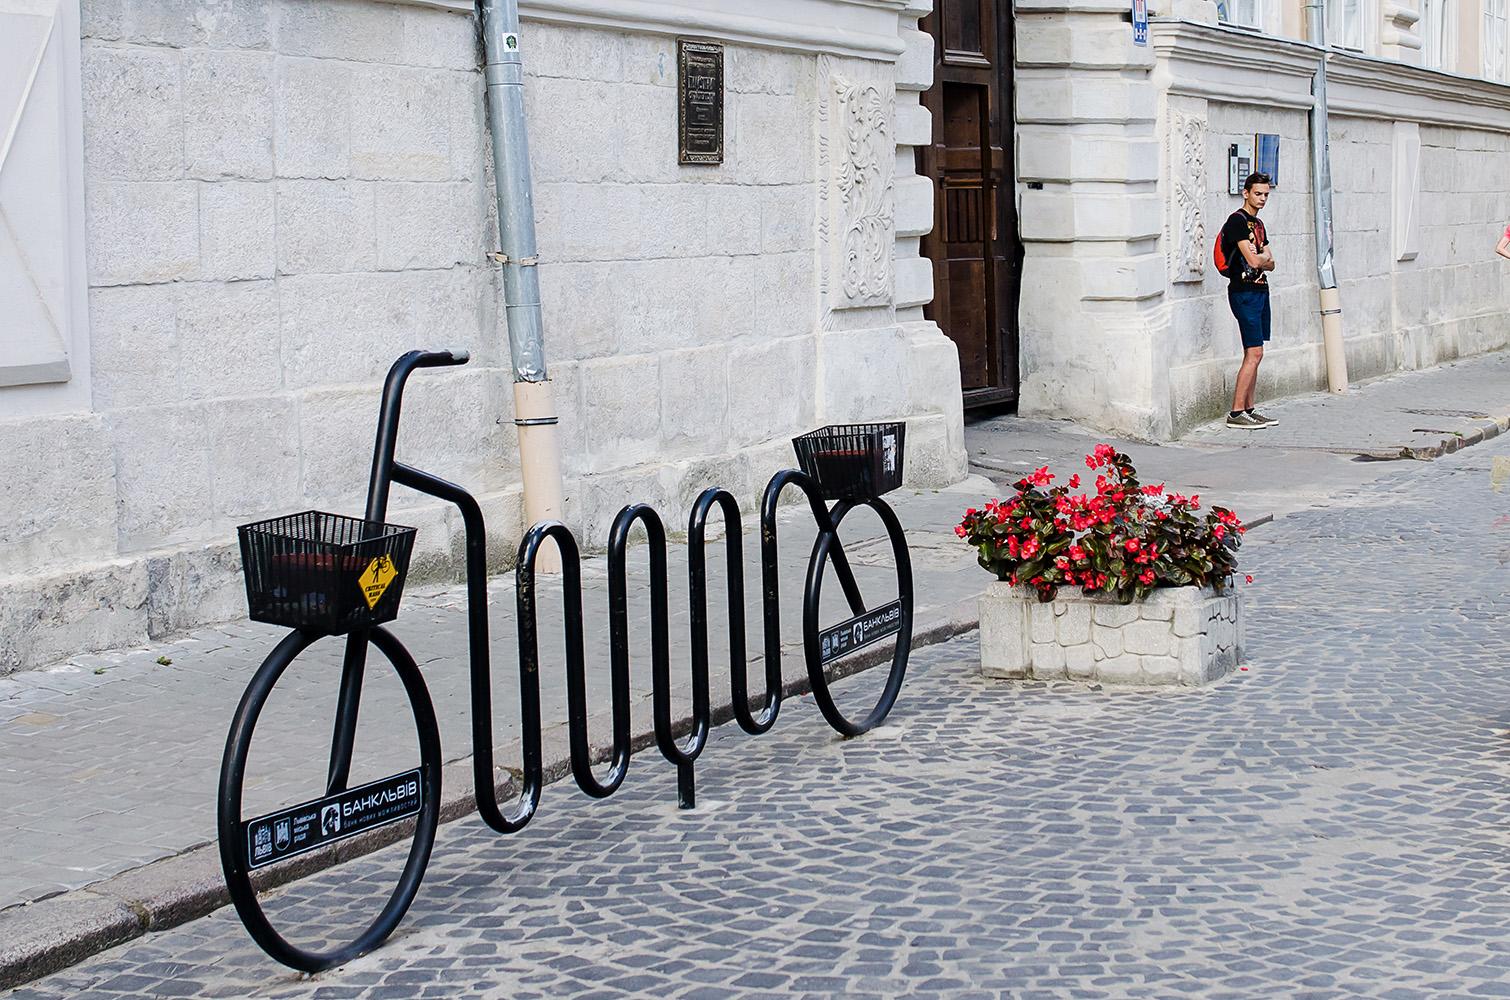 велопарковка велостоянка